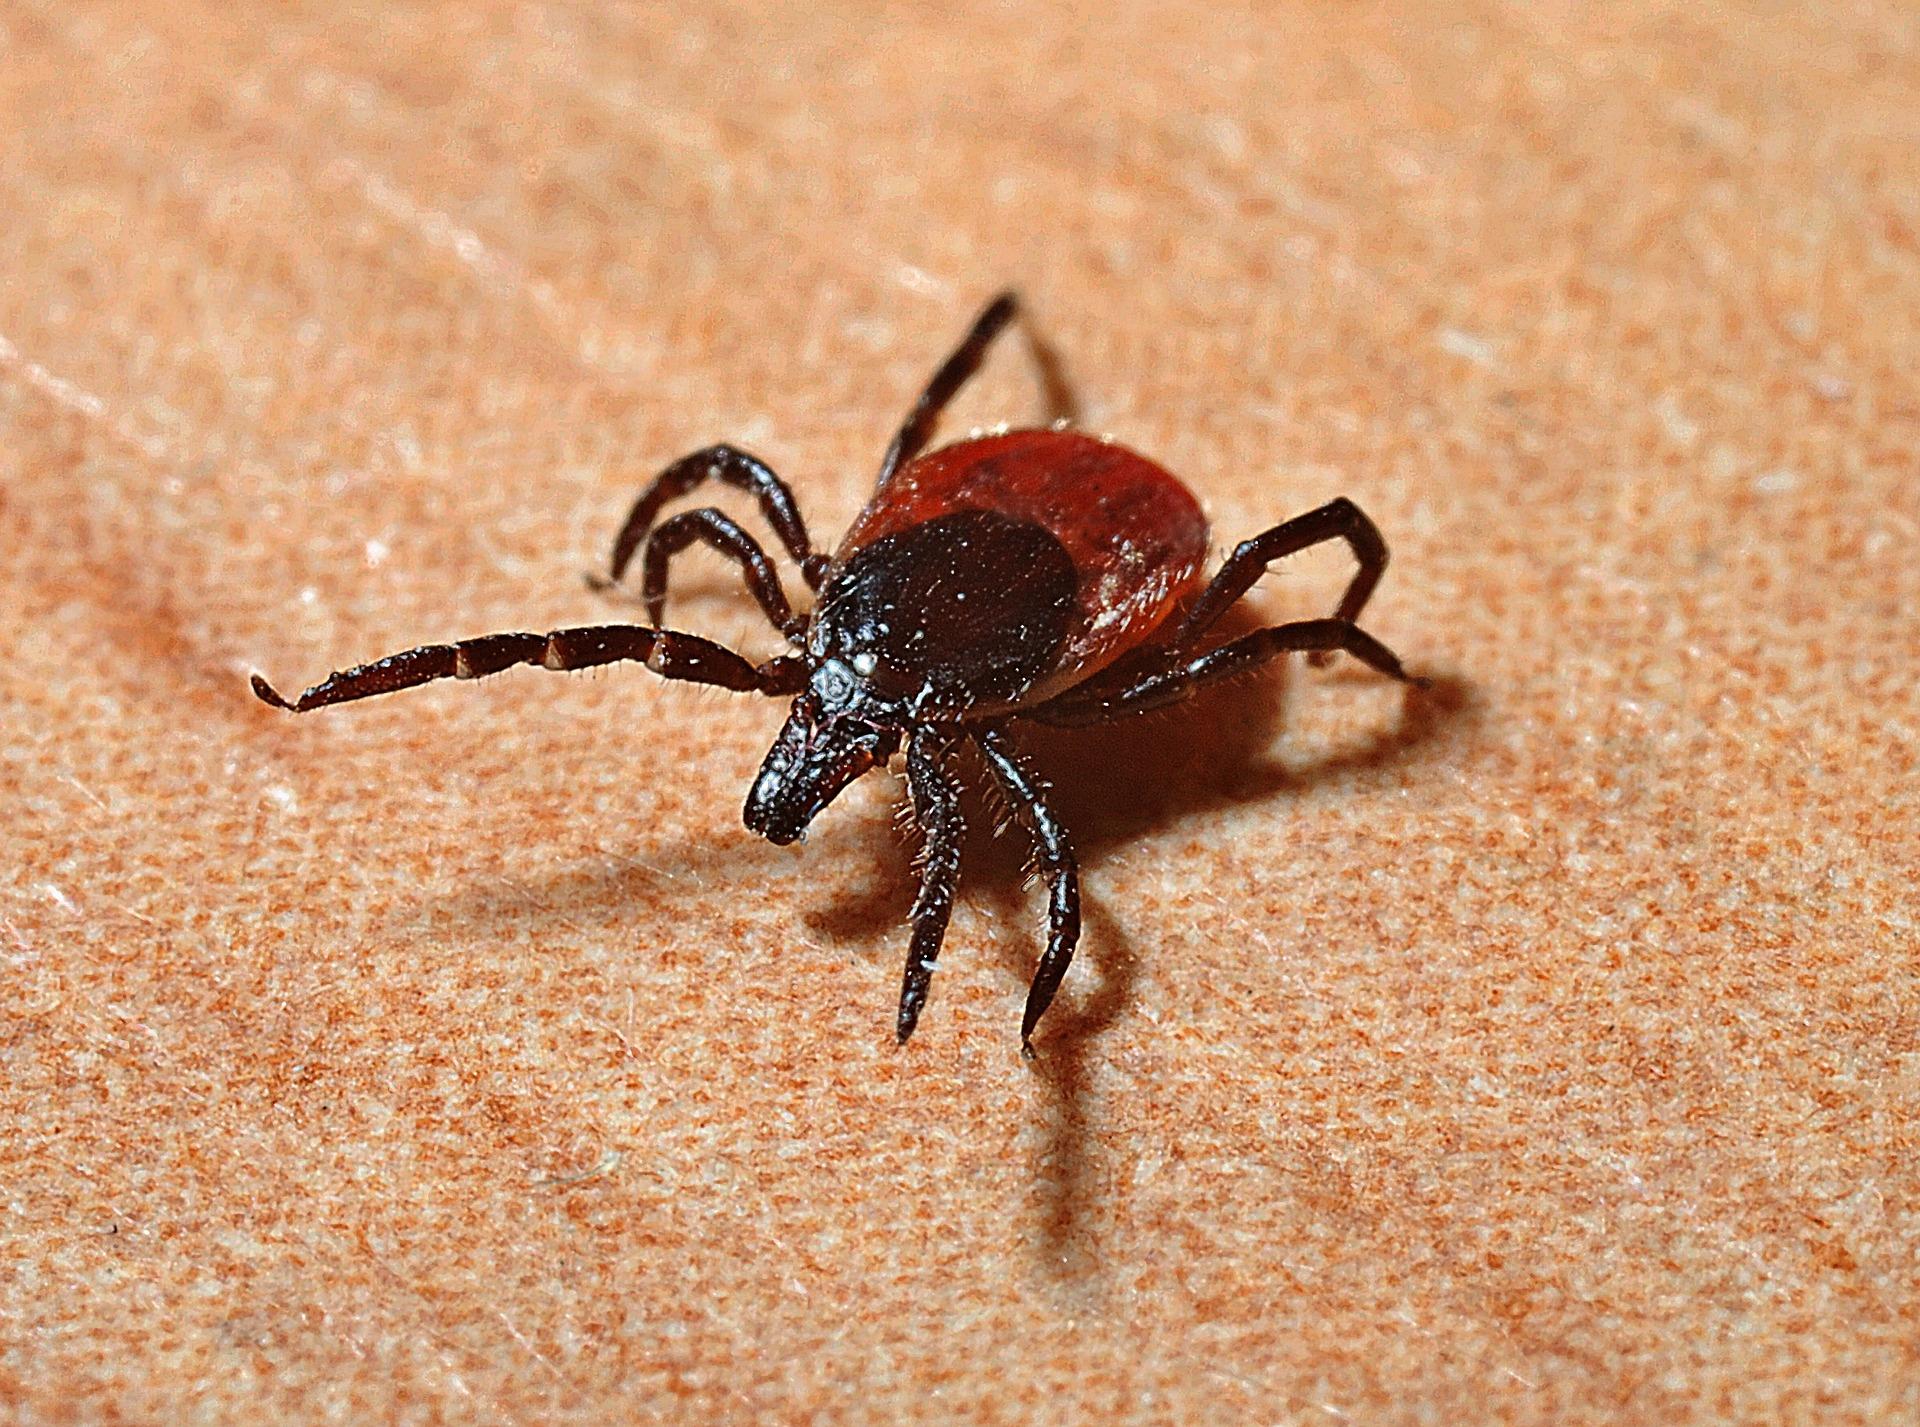 Ticks protection